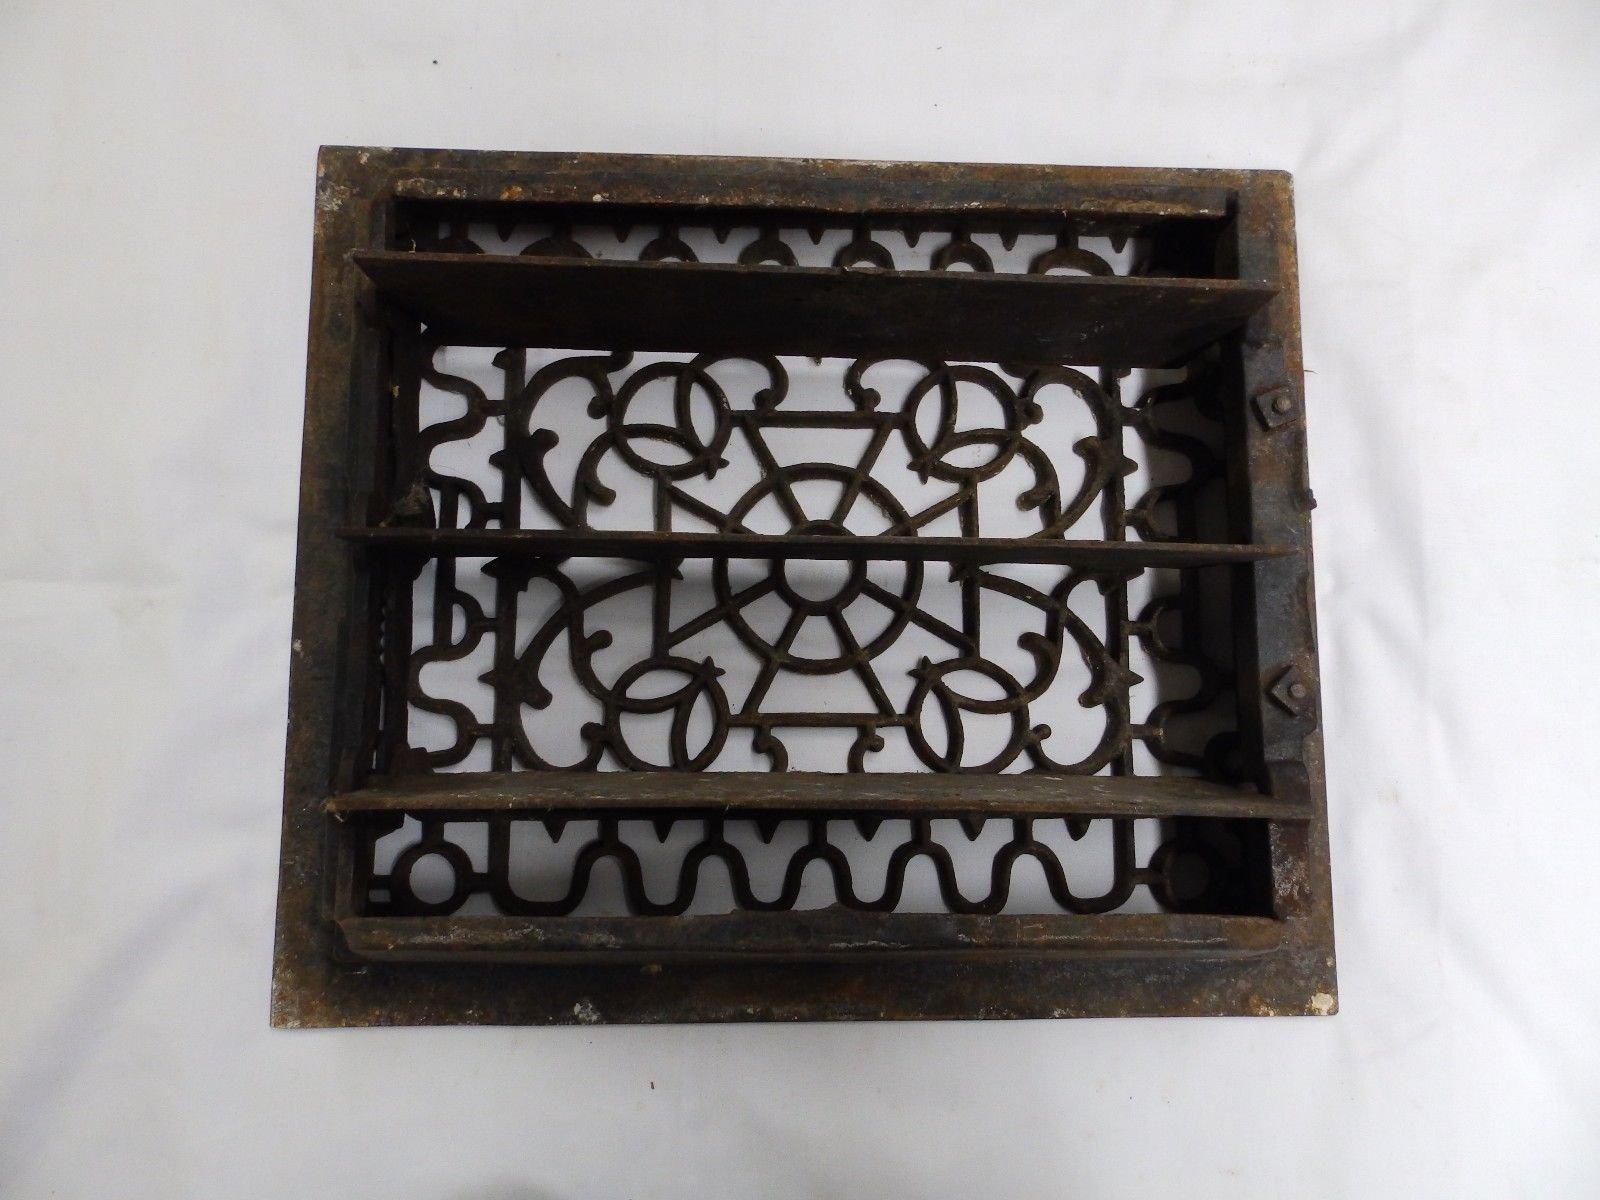 Antique Cast Iron Victorian Heat Grate Register Vent Old Vtg Hardware 4571-15